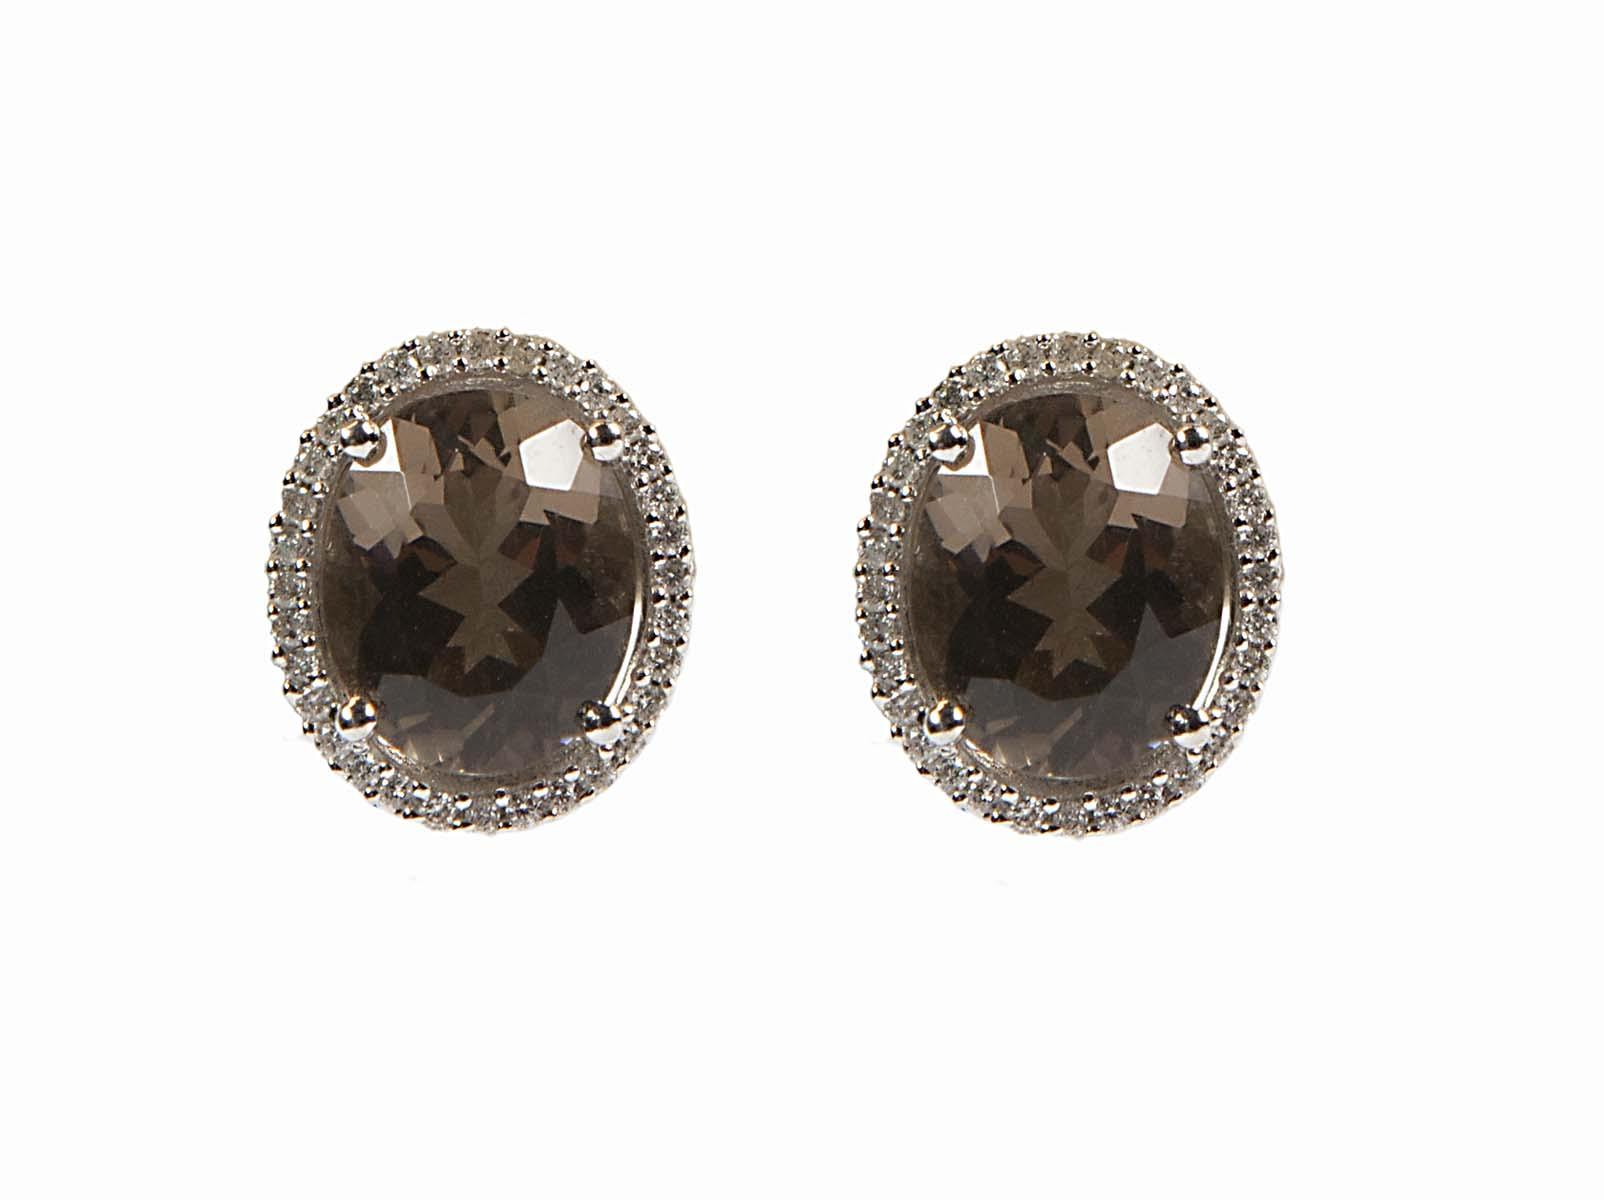 18k smokey quartz and diamond earrings